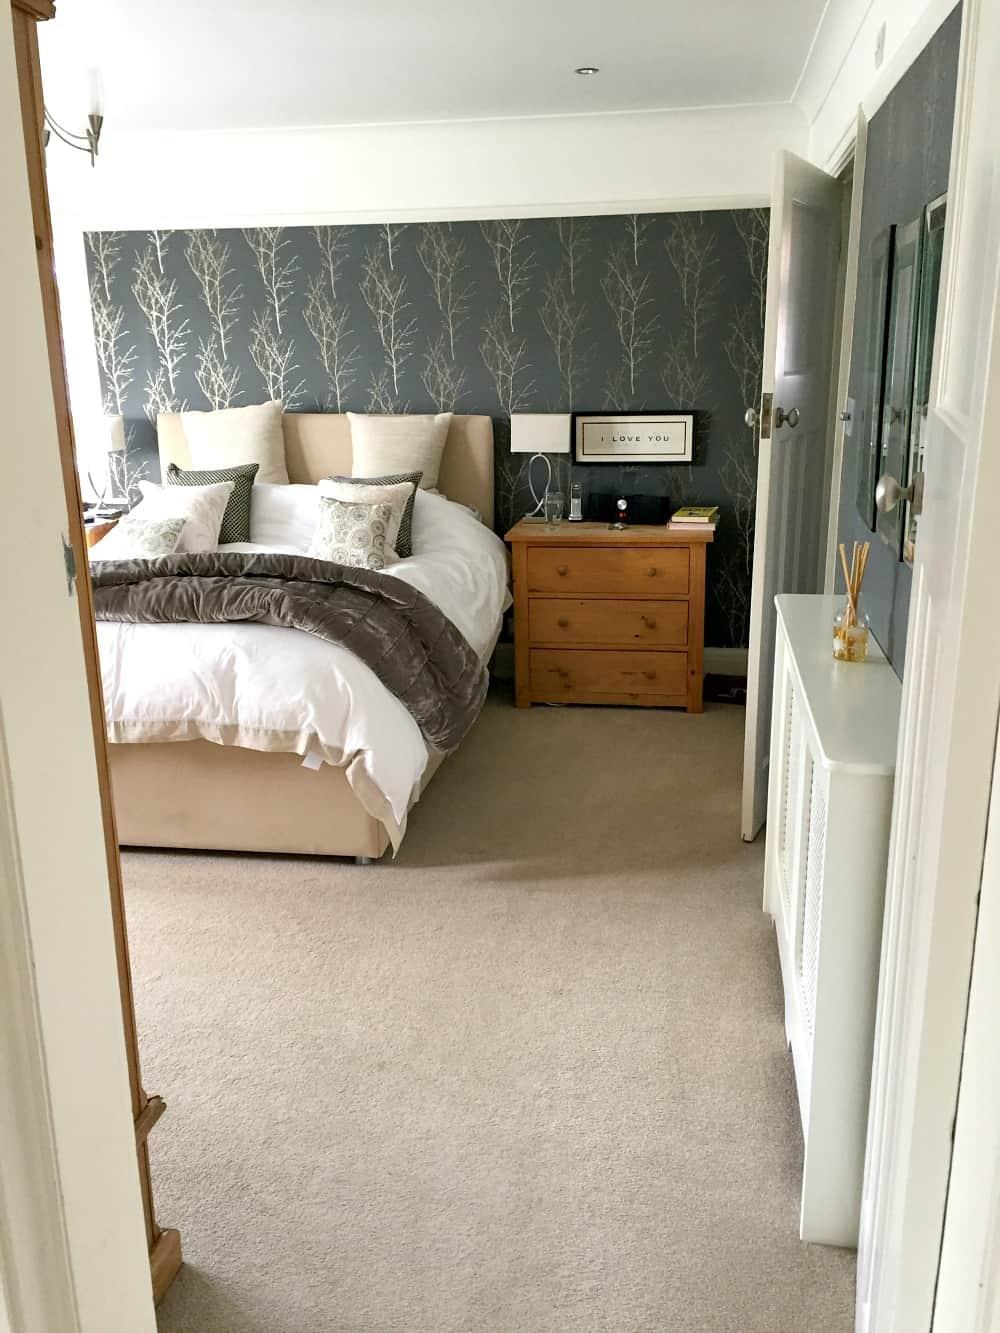 Dark grey wallpaper on walls in Master Bedroom - interior Design - Home Styling - John Lewis Birch Wallpaper